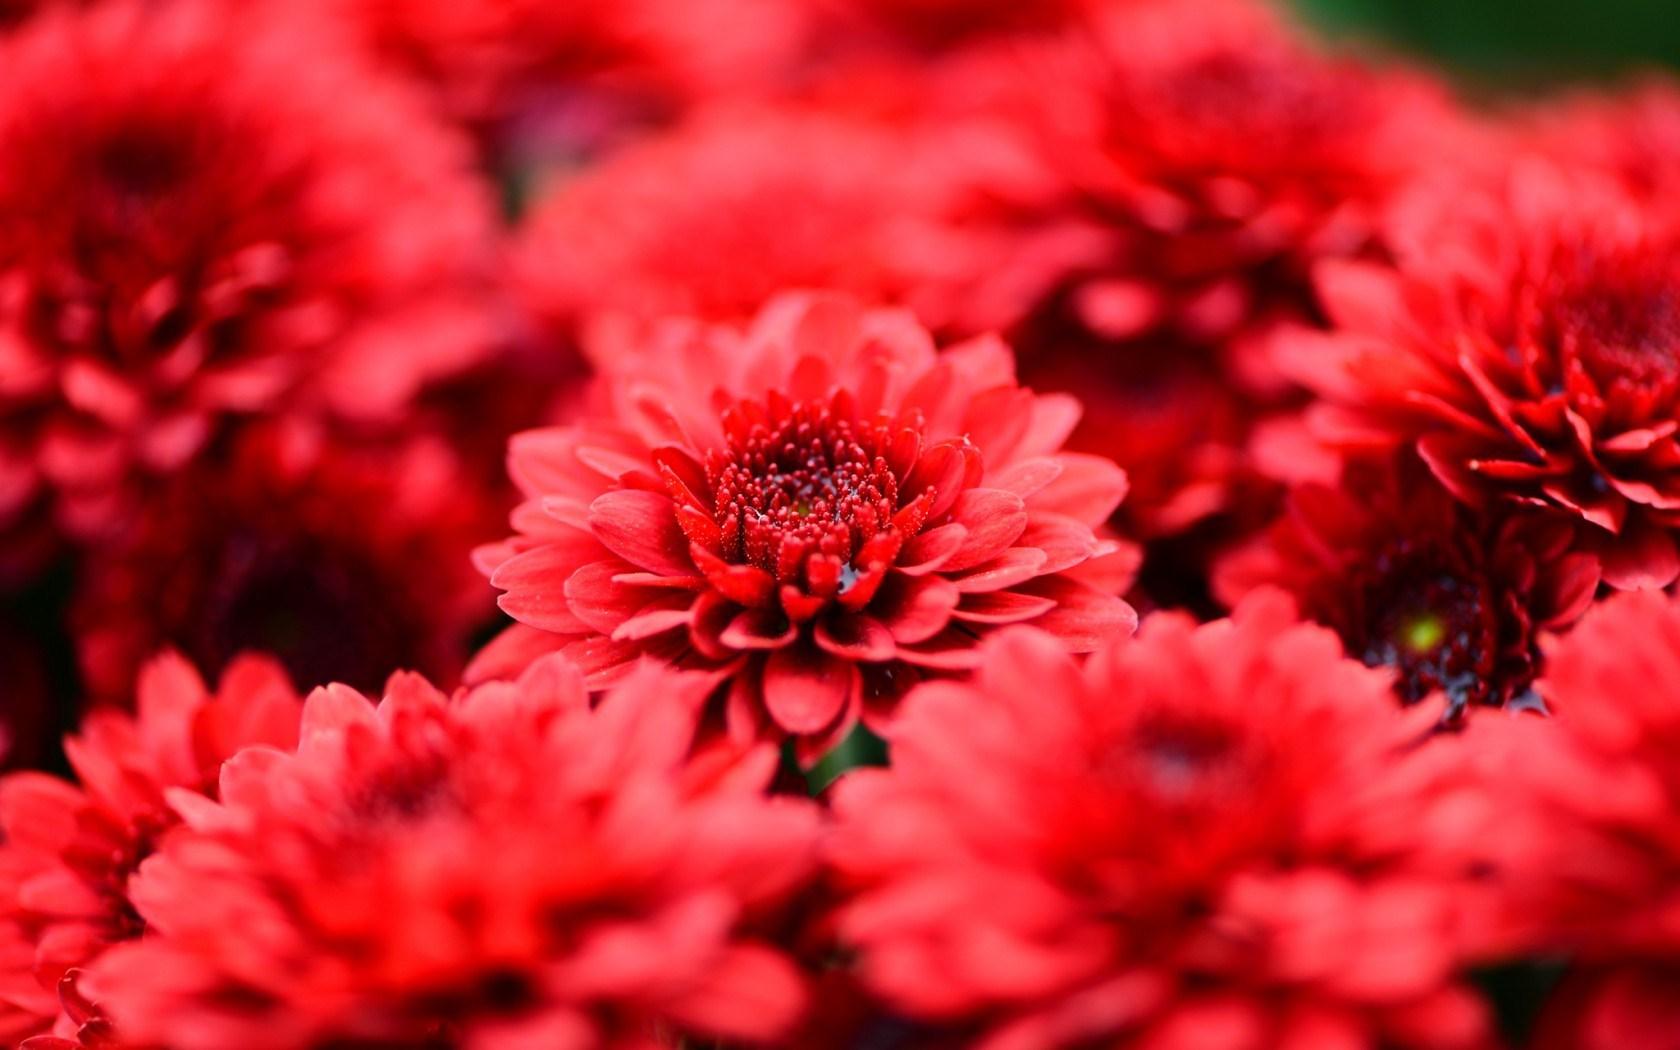 6807778-red-flowers-wallpaper.jpg